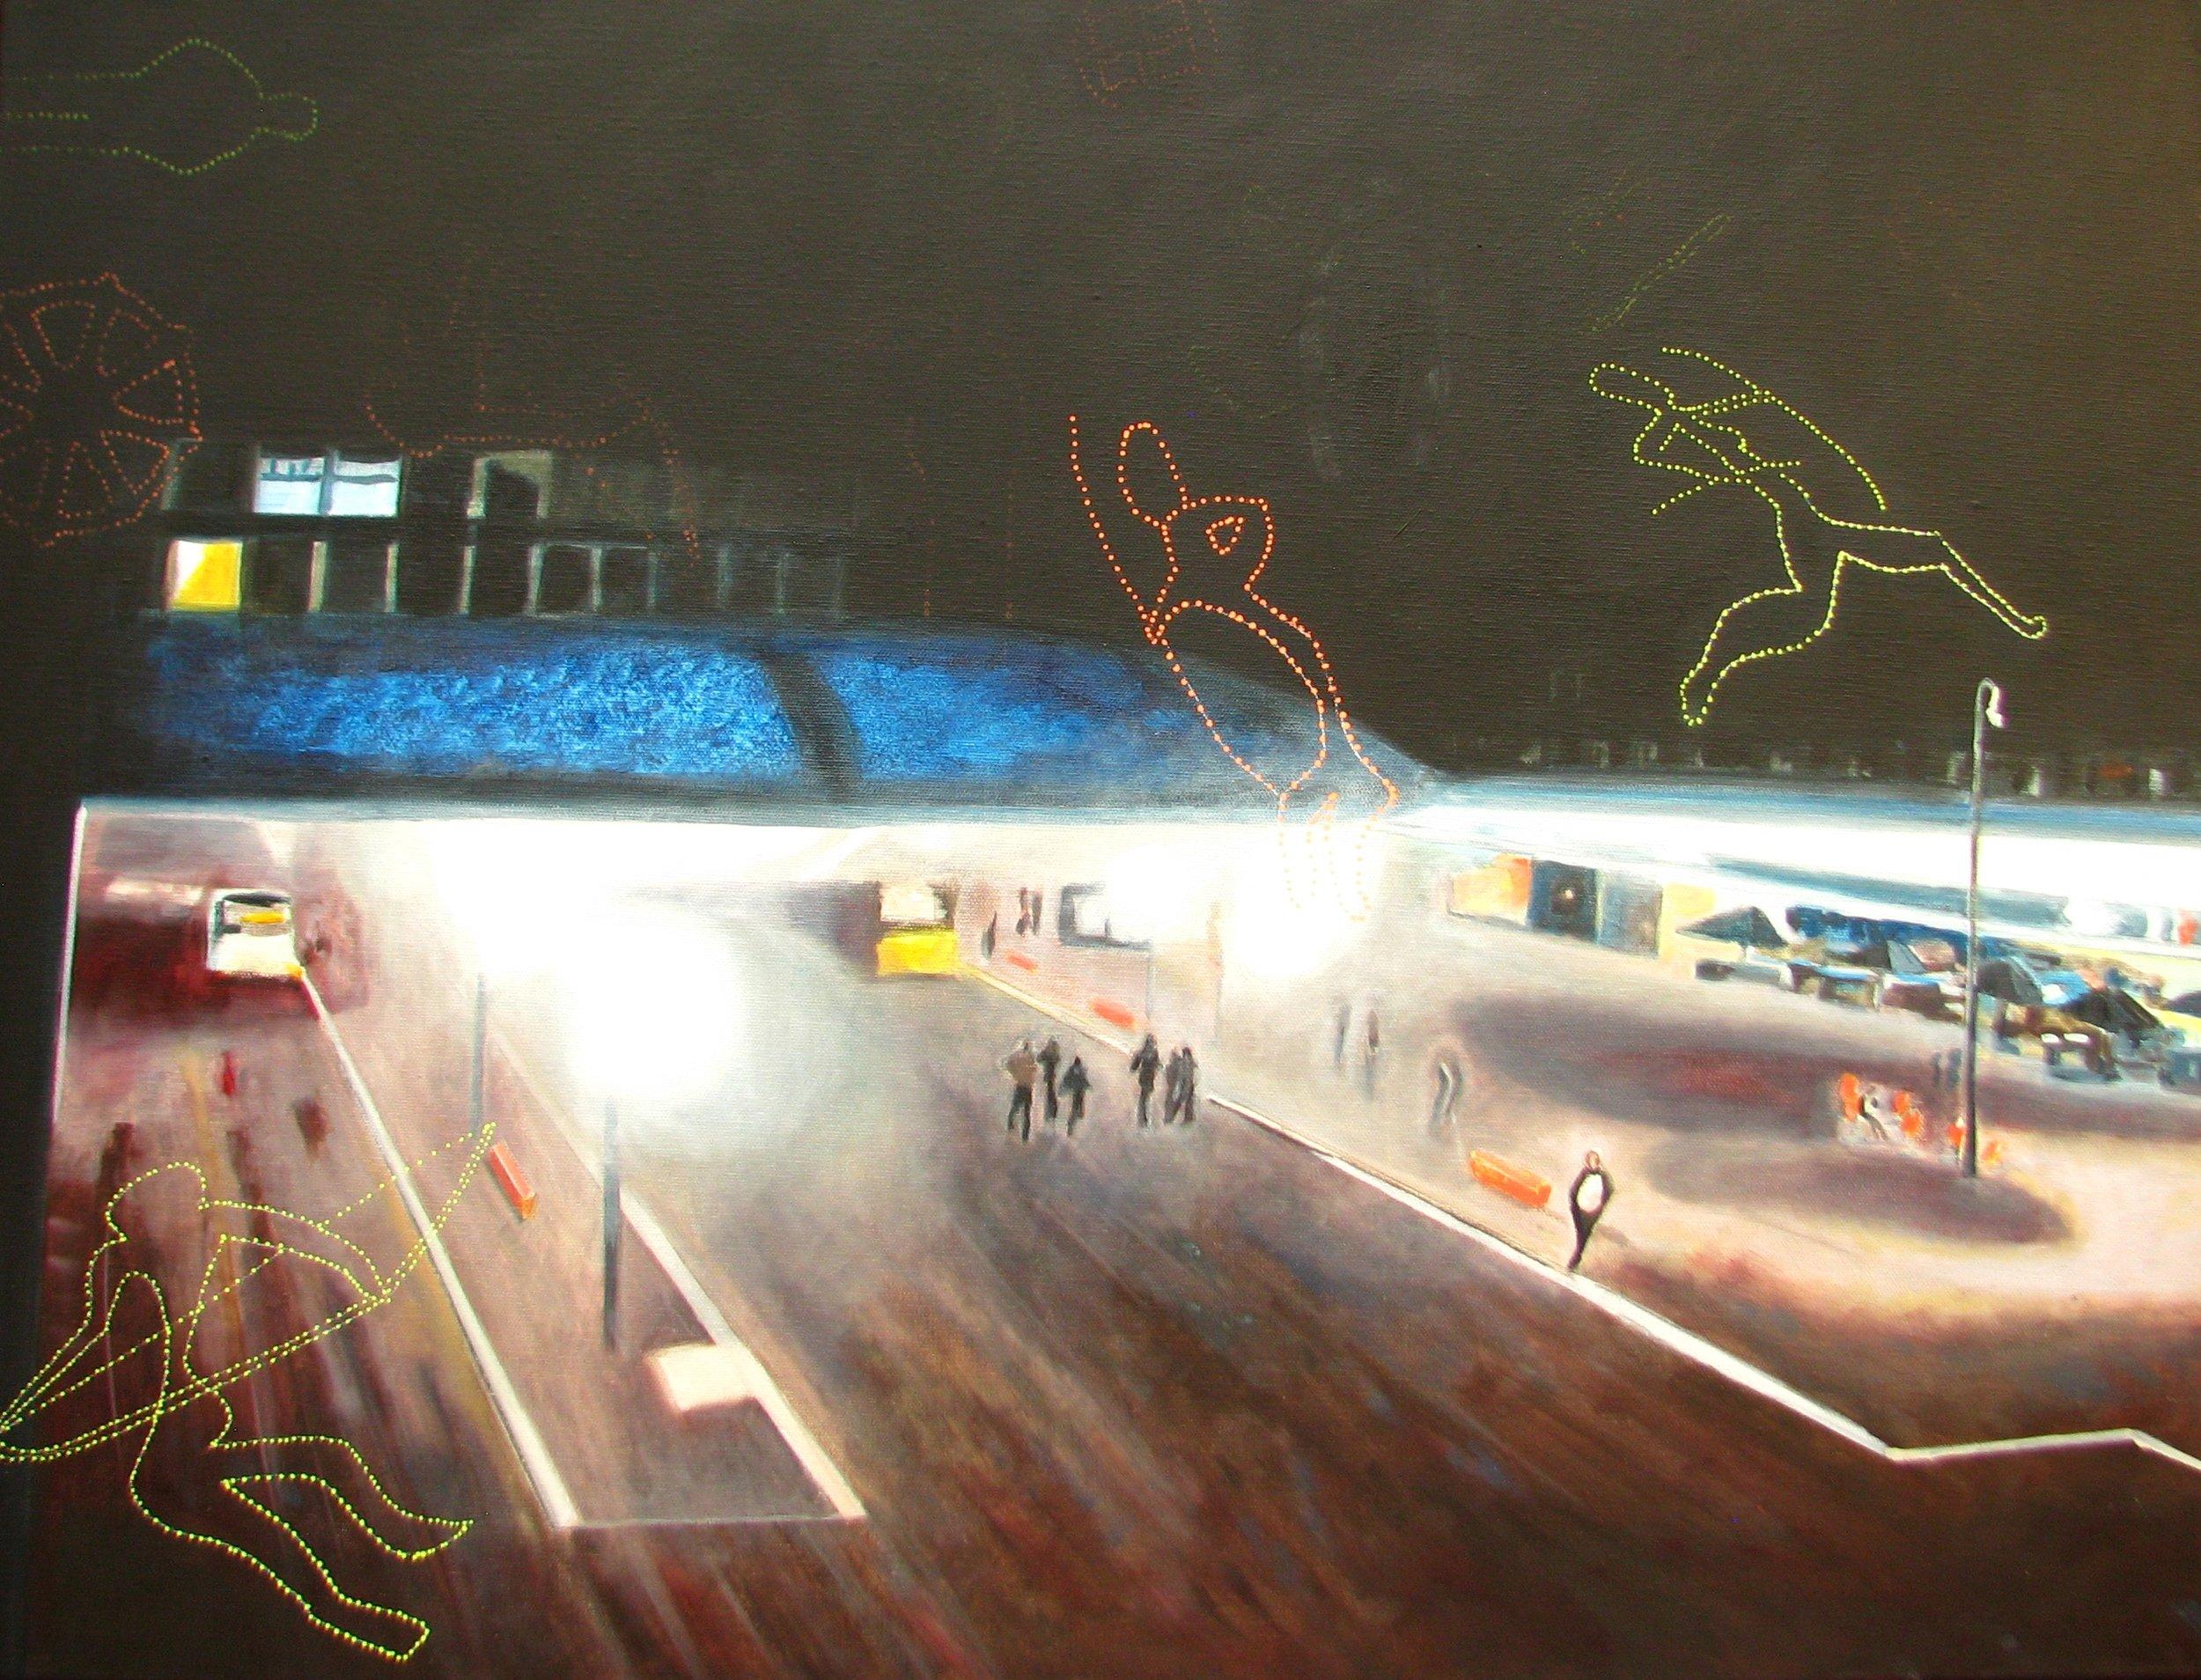 Bahnhof Aarau bei Nacht